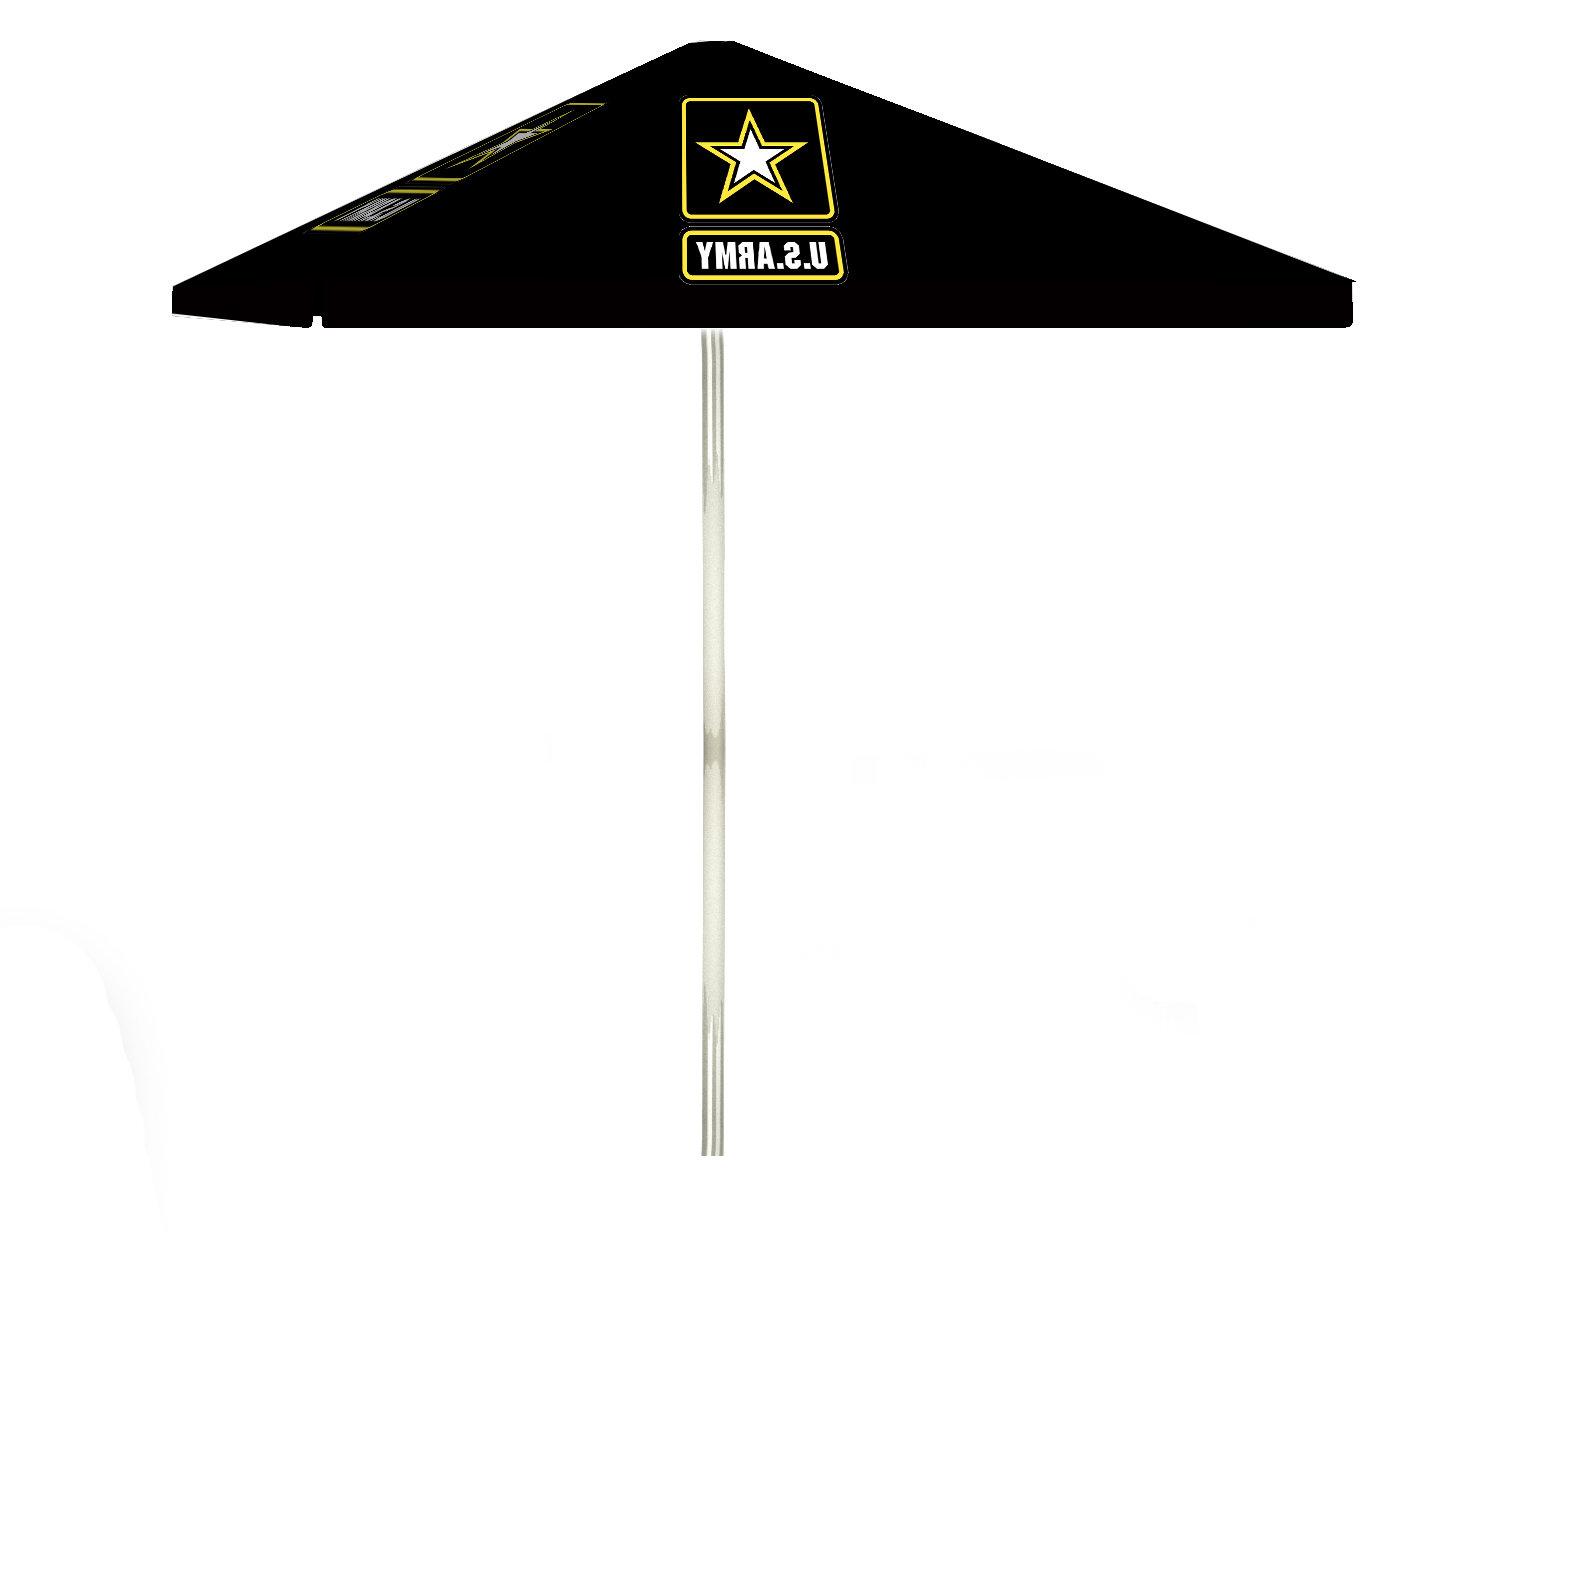 6' Square Market Umbrella In Fashionable Hatten Market Umbrellas (View 10 of 20)